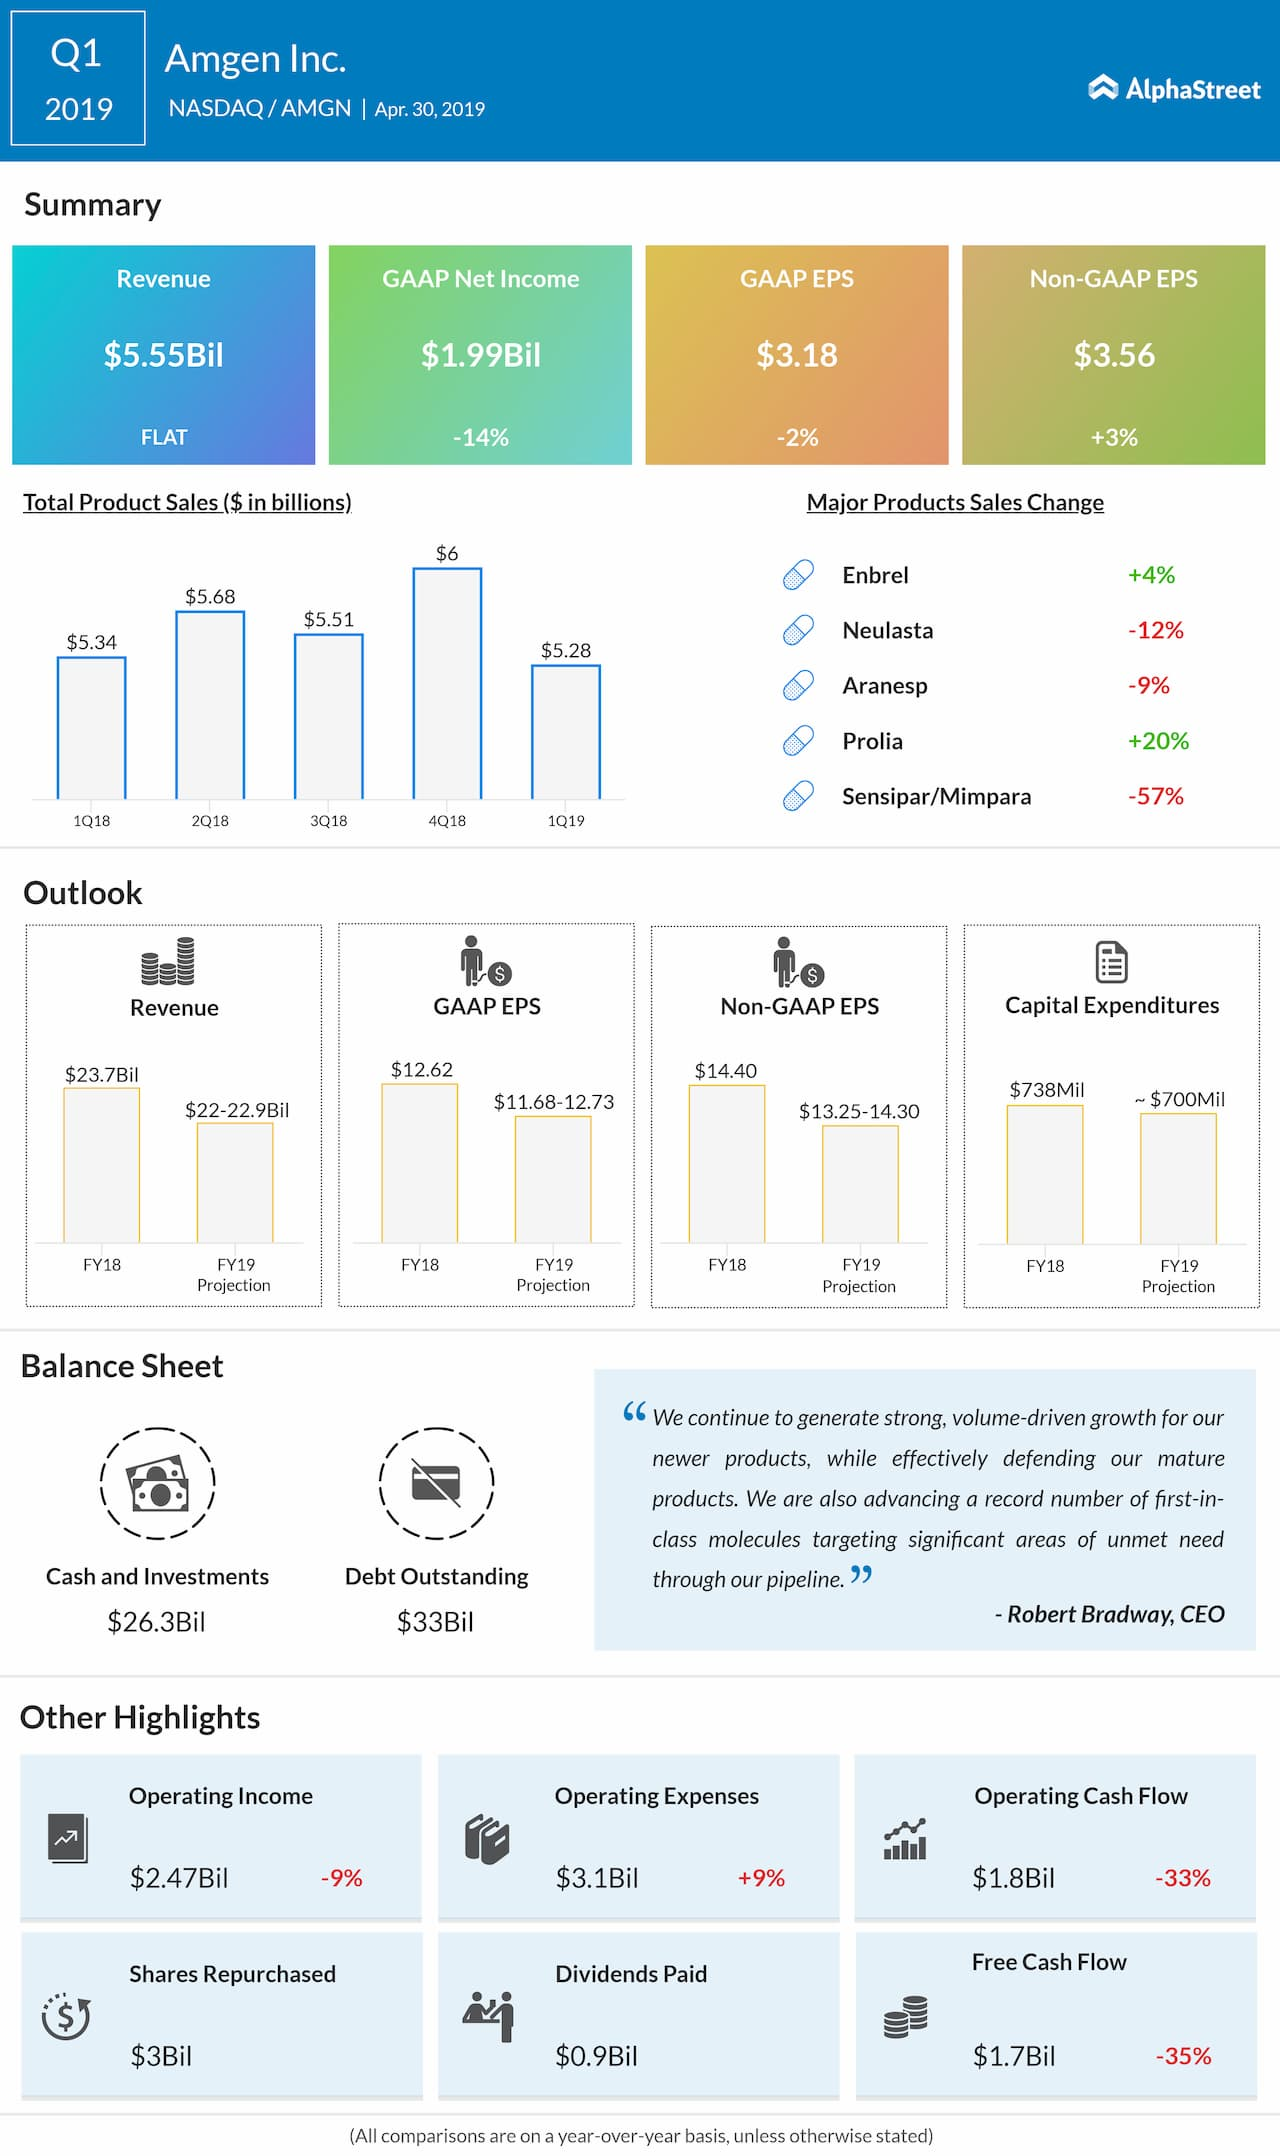 Amgen Q1 2019 earnings infographic